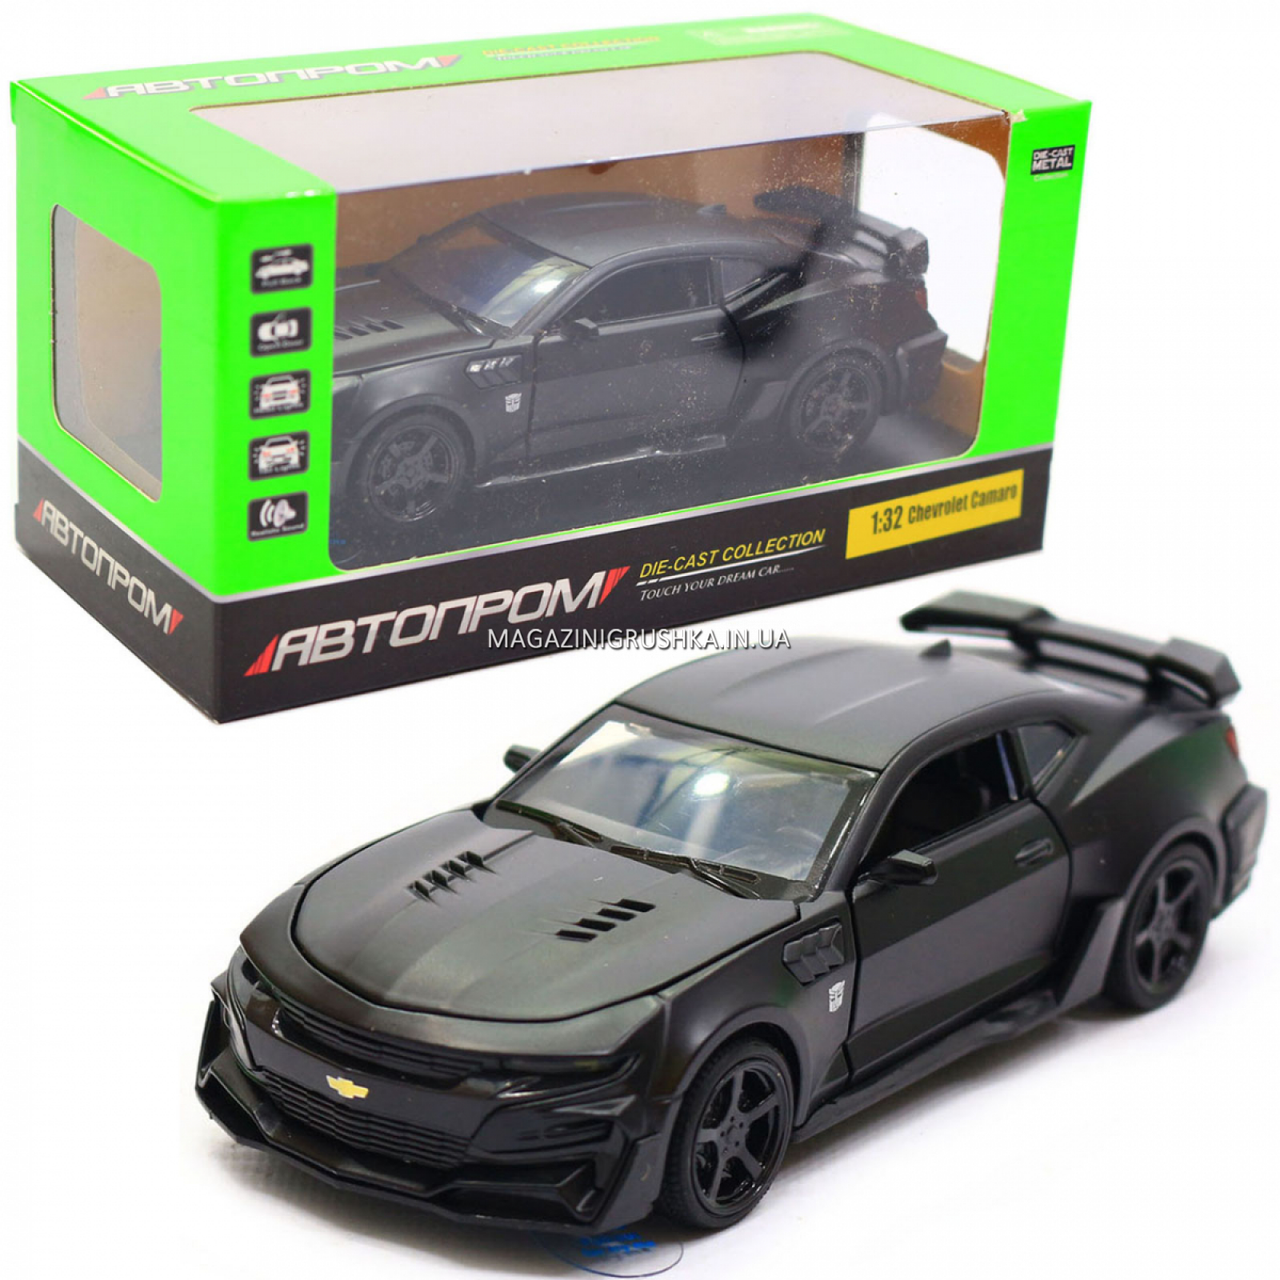 Машинка модель Автопром Chevrolet Самого (Шевроле Камаро) Чорний, 15 см (7863)